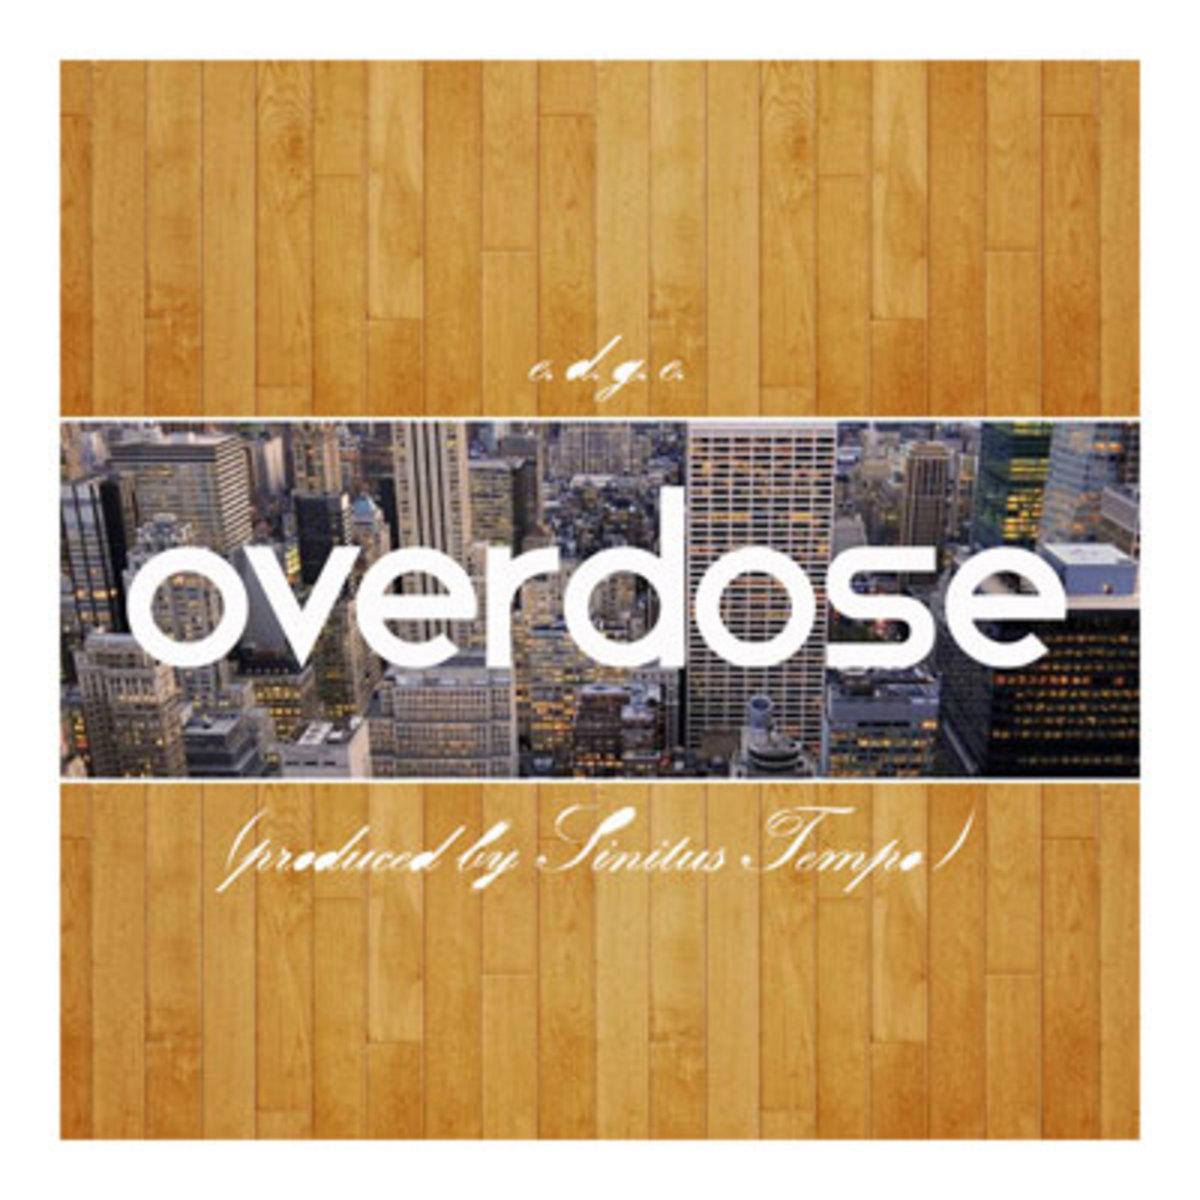 edge-overdose.jpg